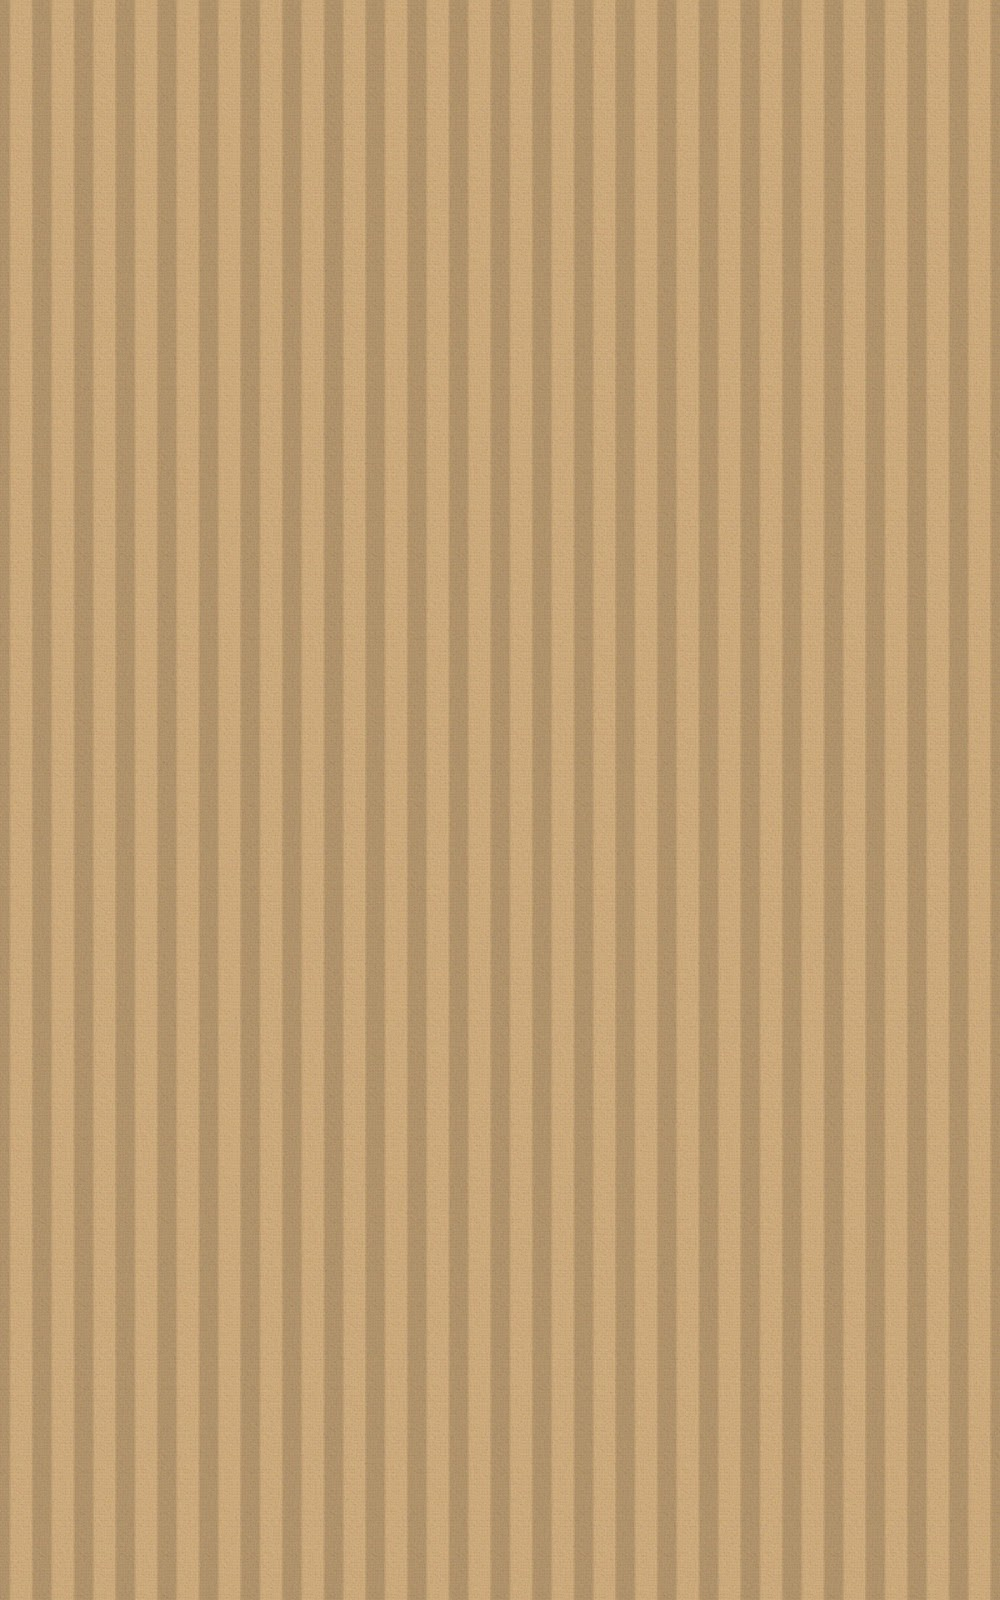 kindle fire hd wallpaper 1000x1600